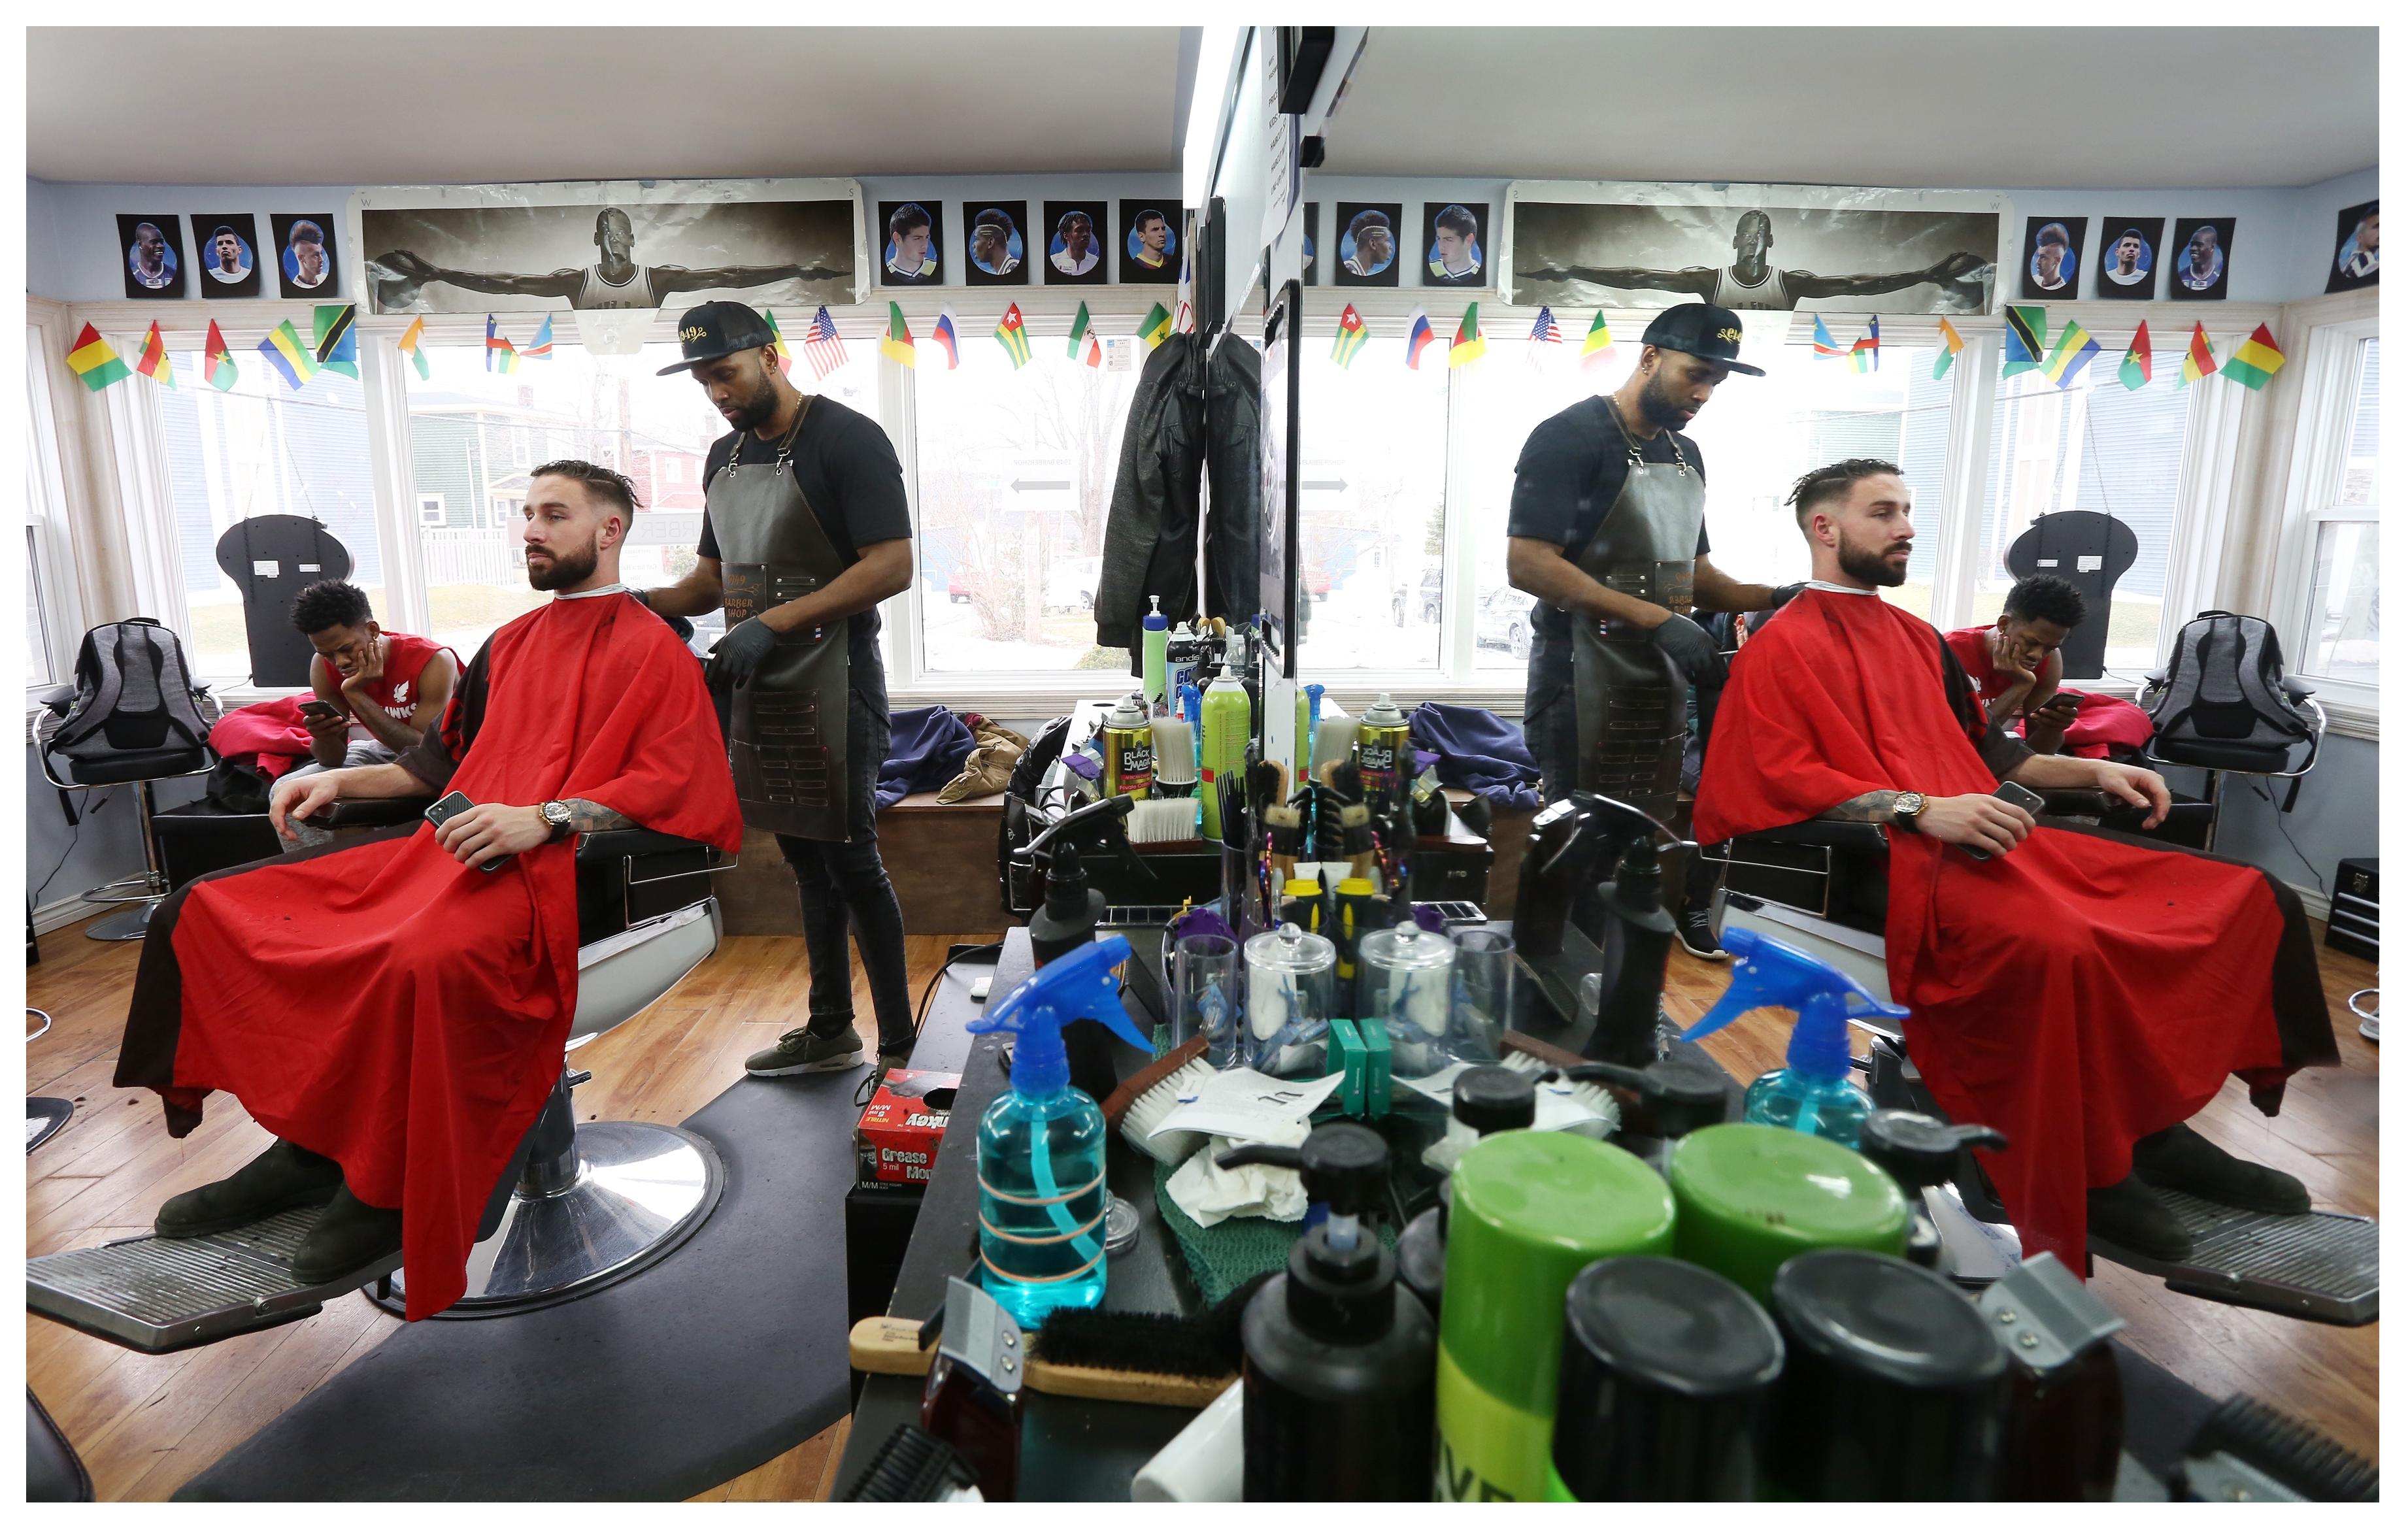 Liam Condon getsa haircut from co-owner Gustav Valoyes, as Sea-Hawk Daniel Gordon waits for his turn. (Paul Daly)